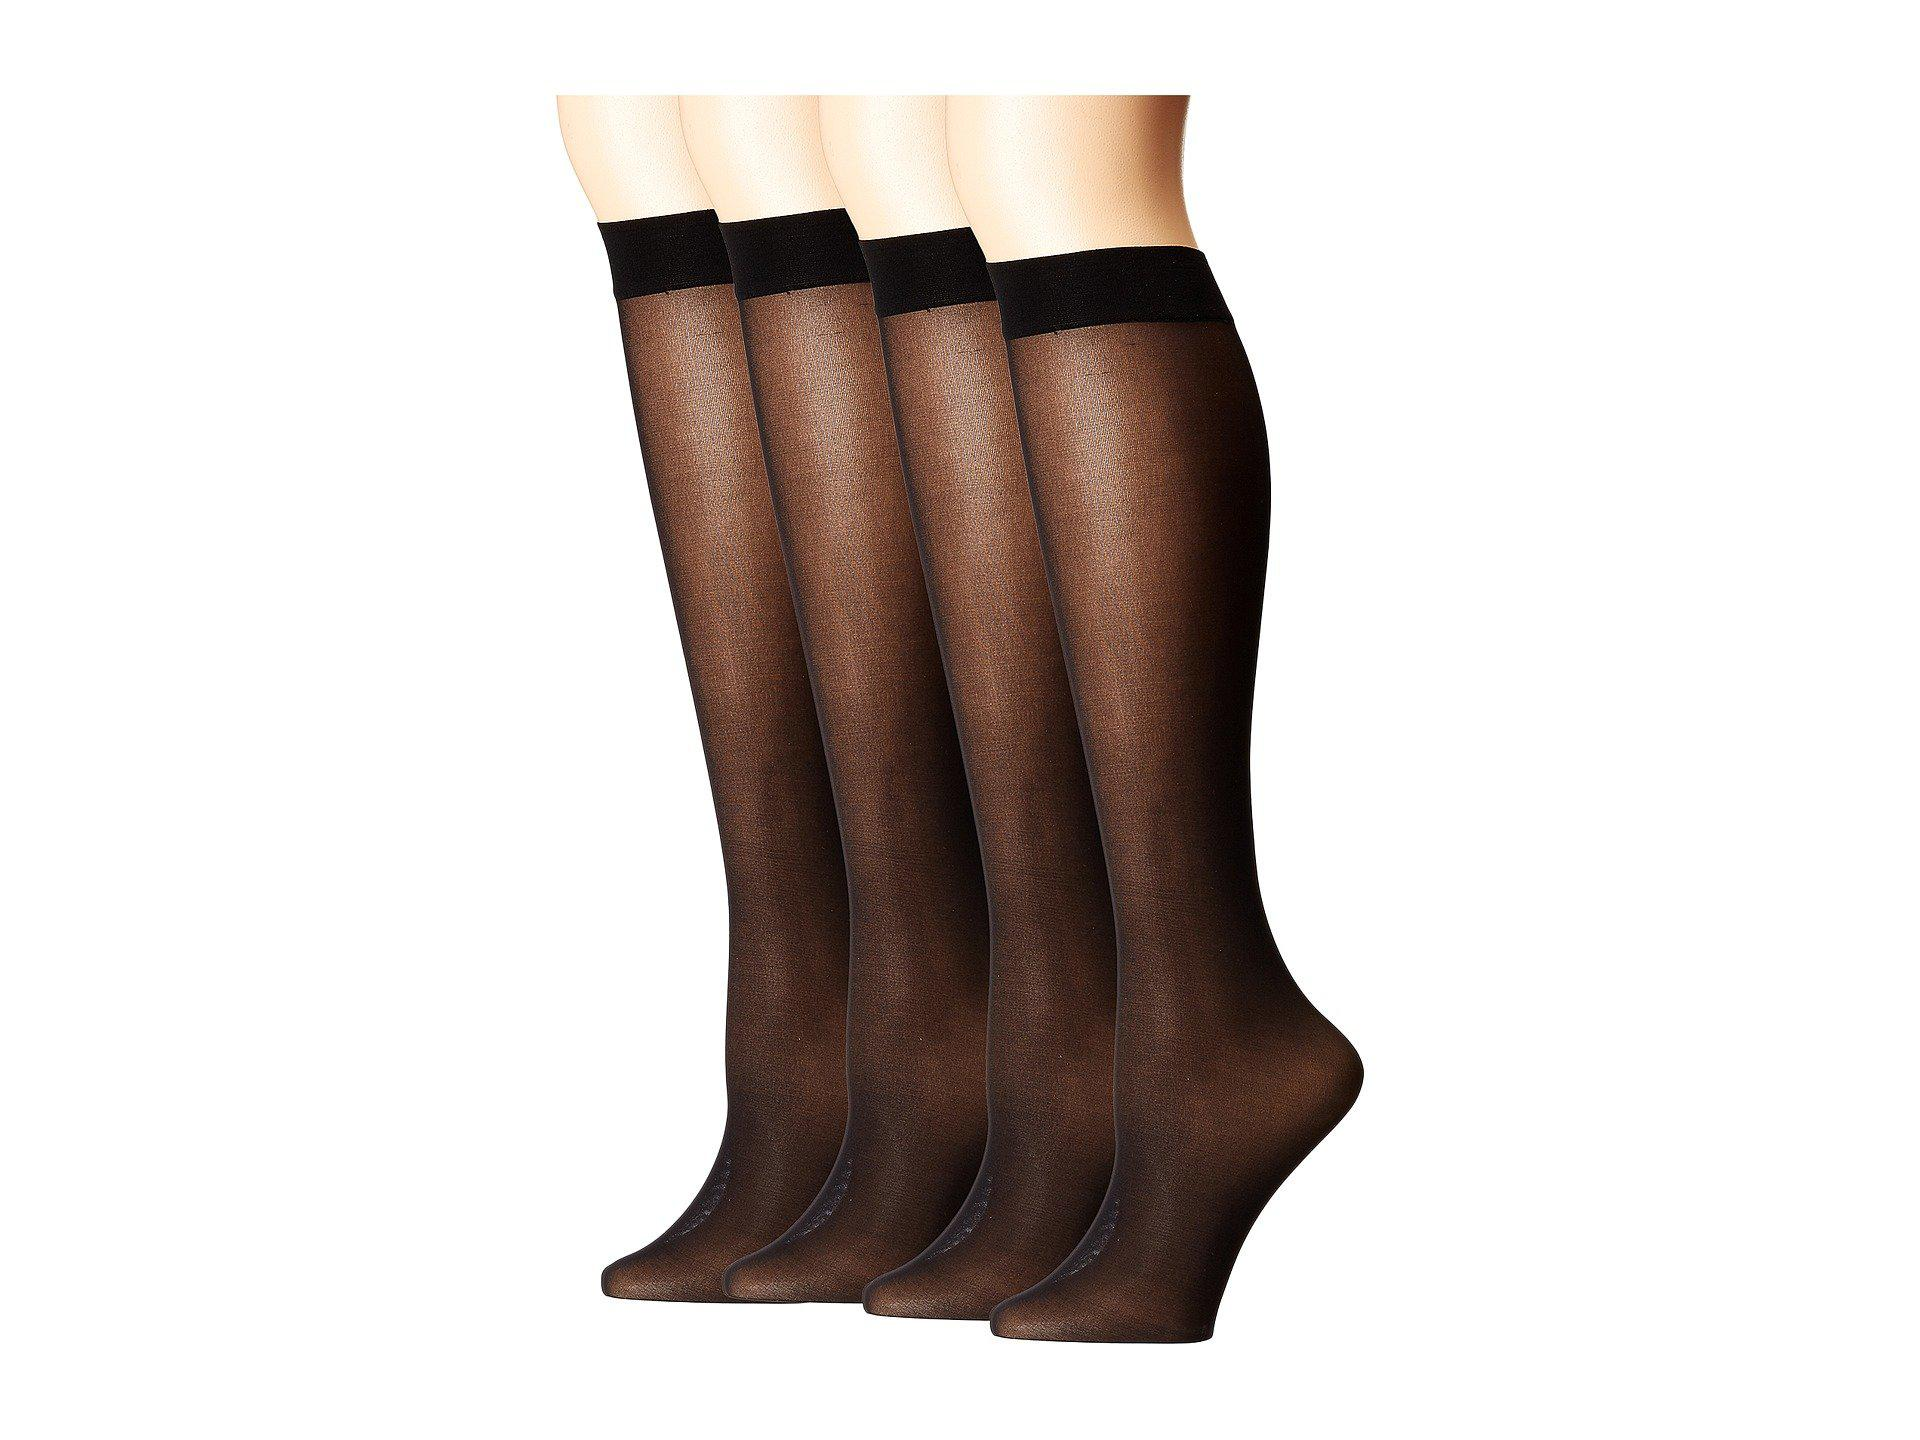 5c97af9876d Hue. Opaque Knee High 4-pair Pack (black) Women s Knee High Socks Shoes